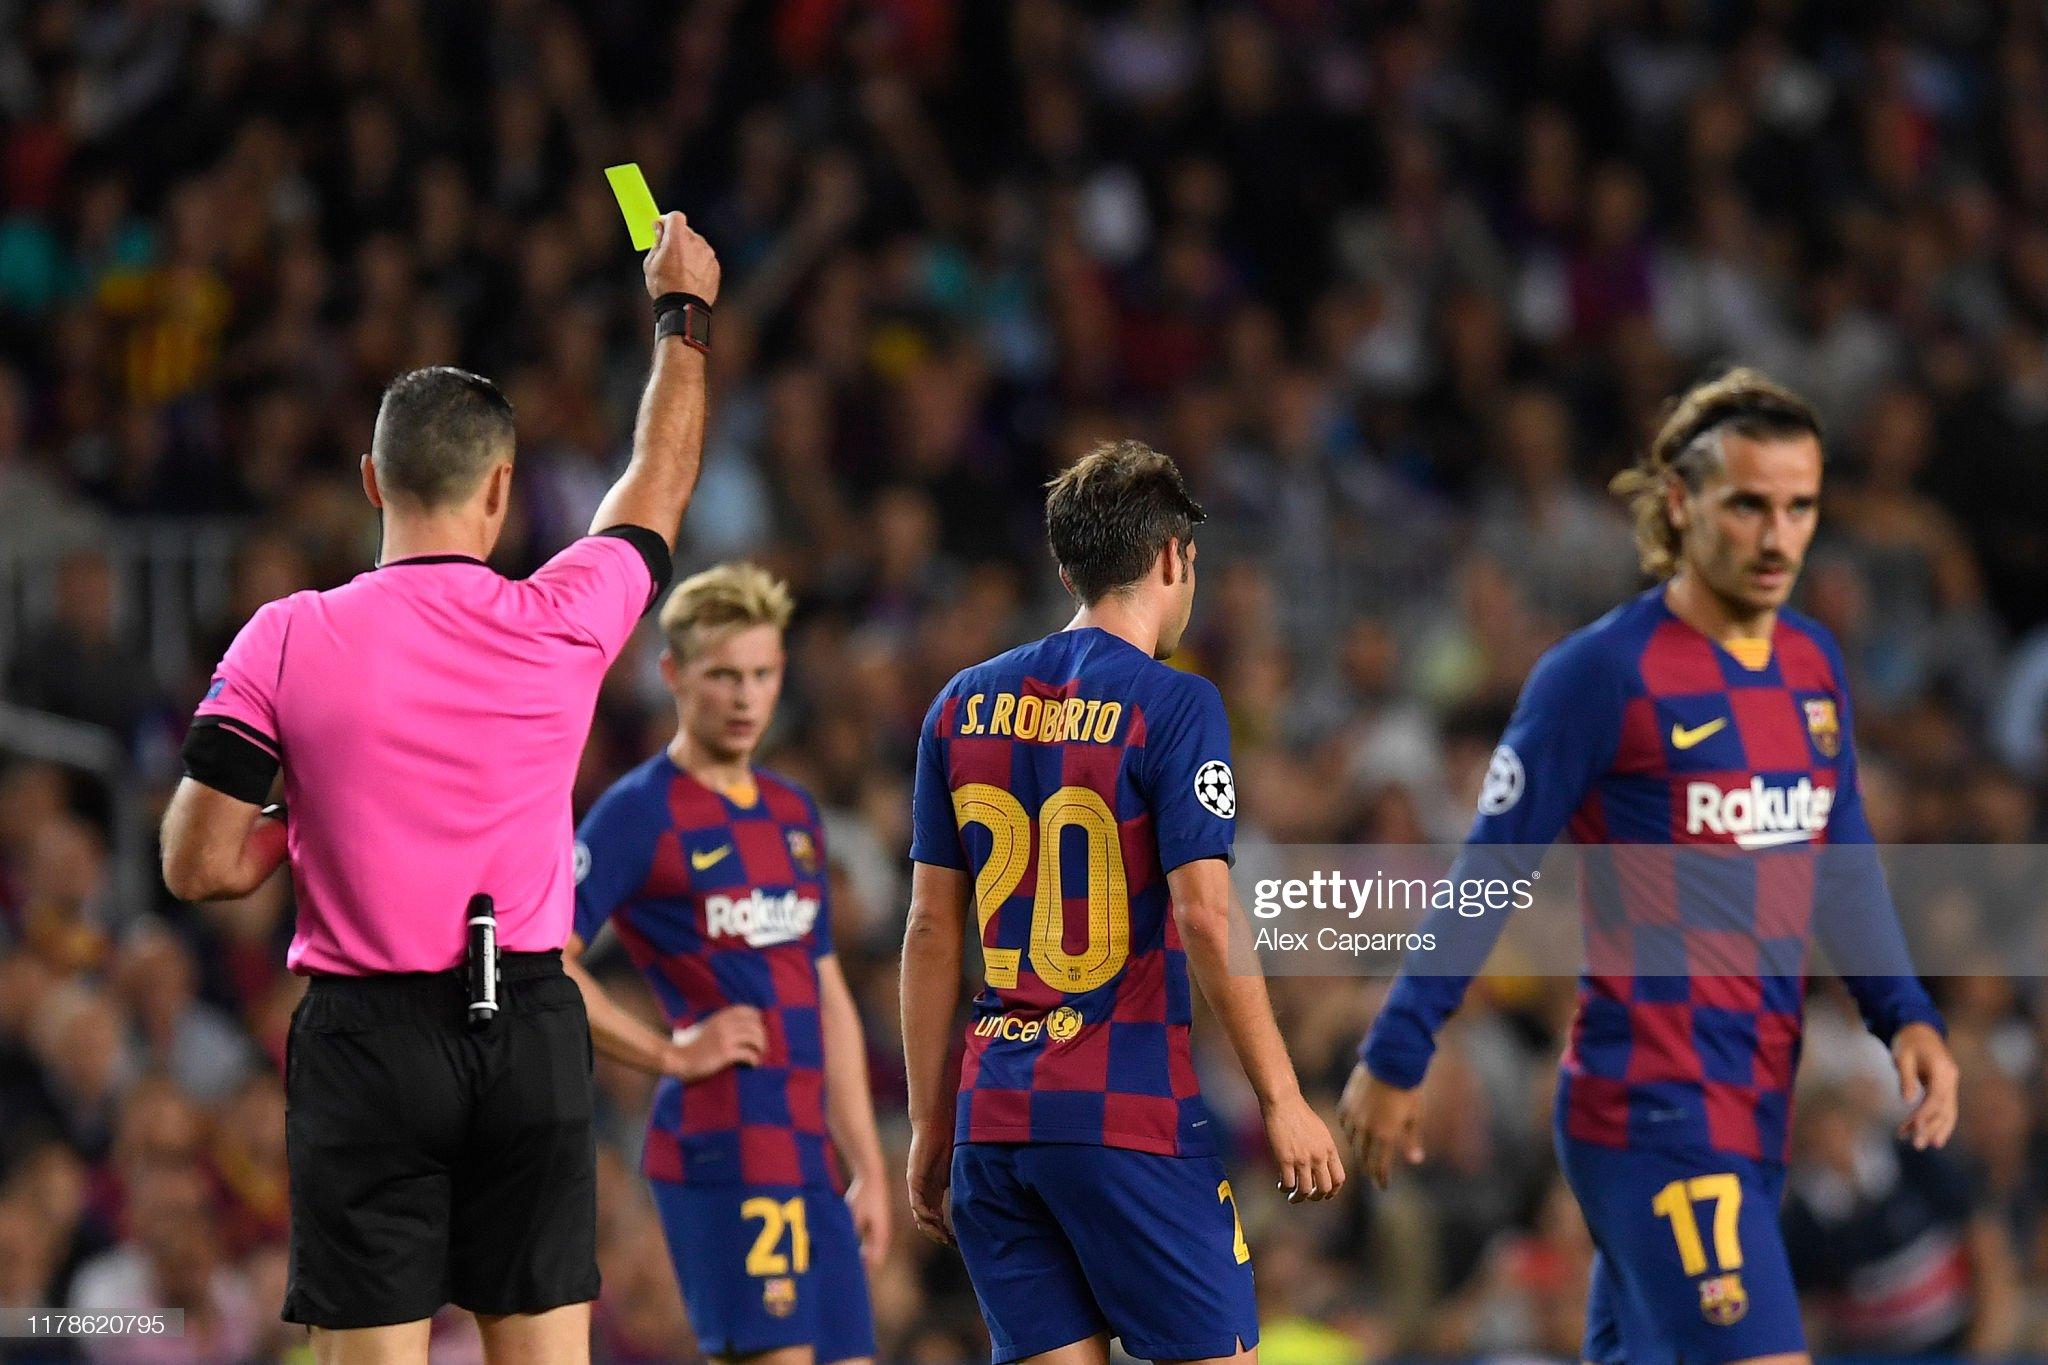 صور مباراة : برشلونة - إنتر 2-1 ( 02-10-2019 )  Sergi-roberto-of-fc-barcelona-is-shown-a-yellow-card-during-the-uefa-picture-id1178620795?s=2048x2048